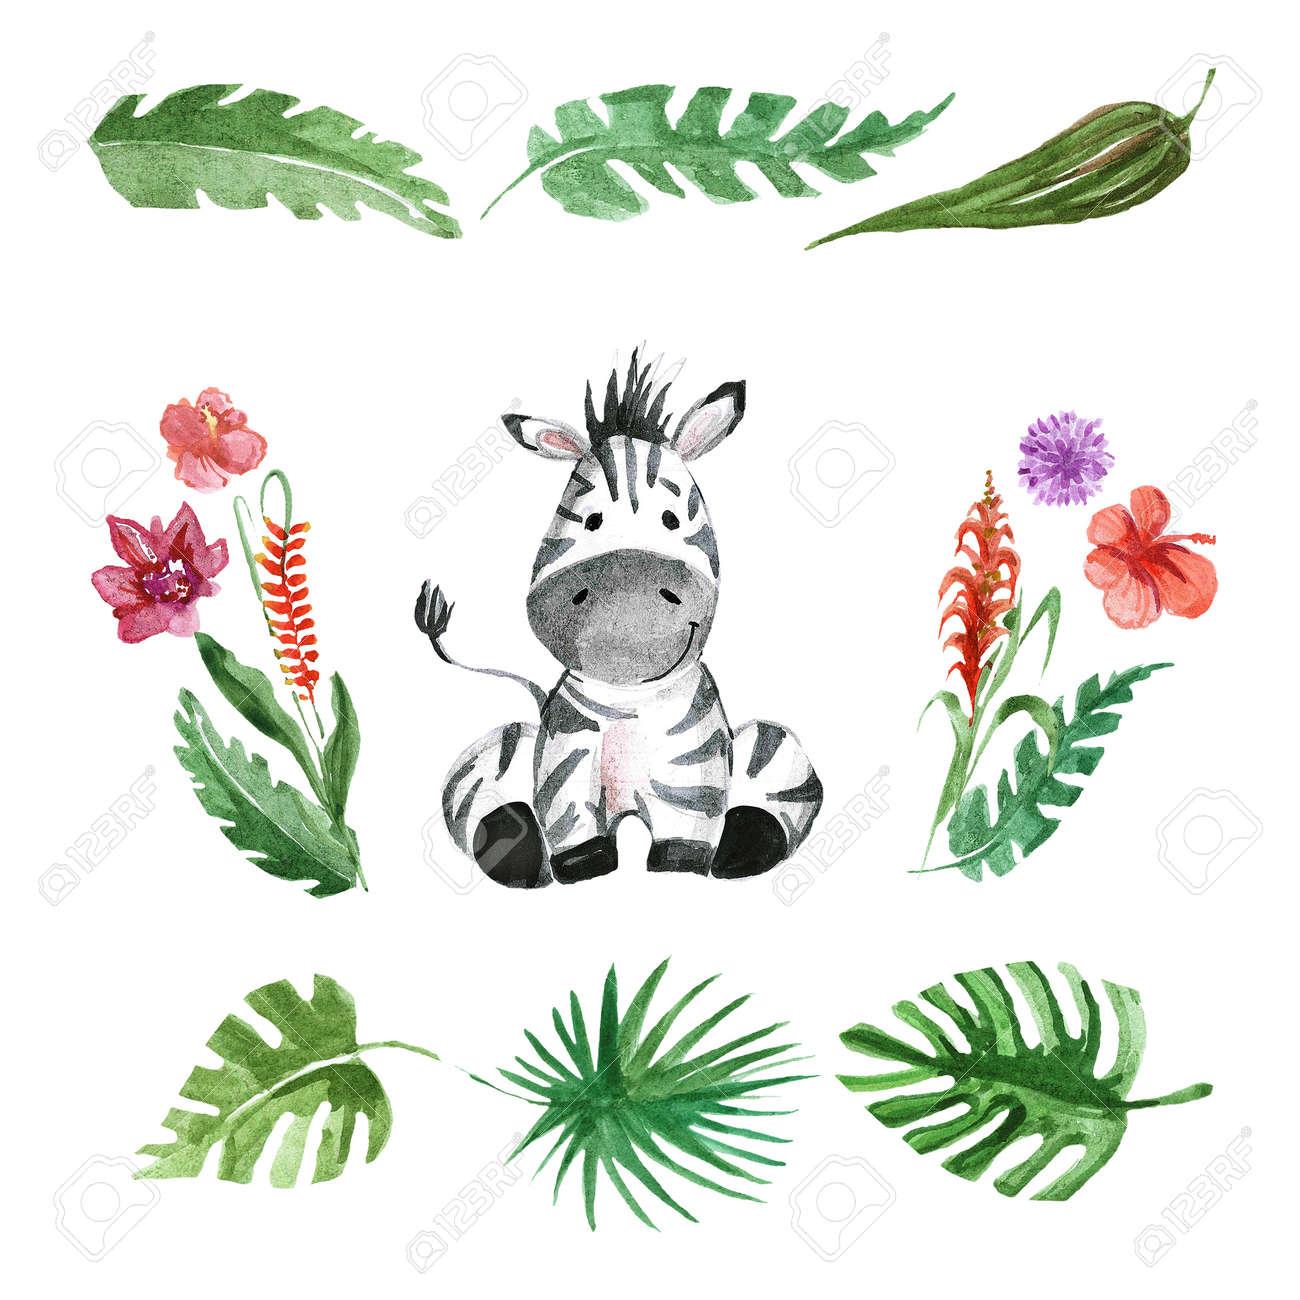 Cute baby Zebra Animal for kindergarten, nursery, children clothing, kids pattern, invitation, baby shower - 67279878